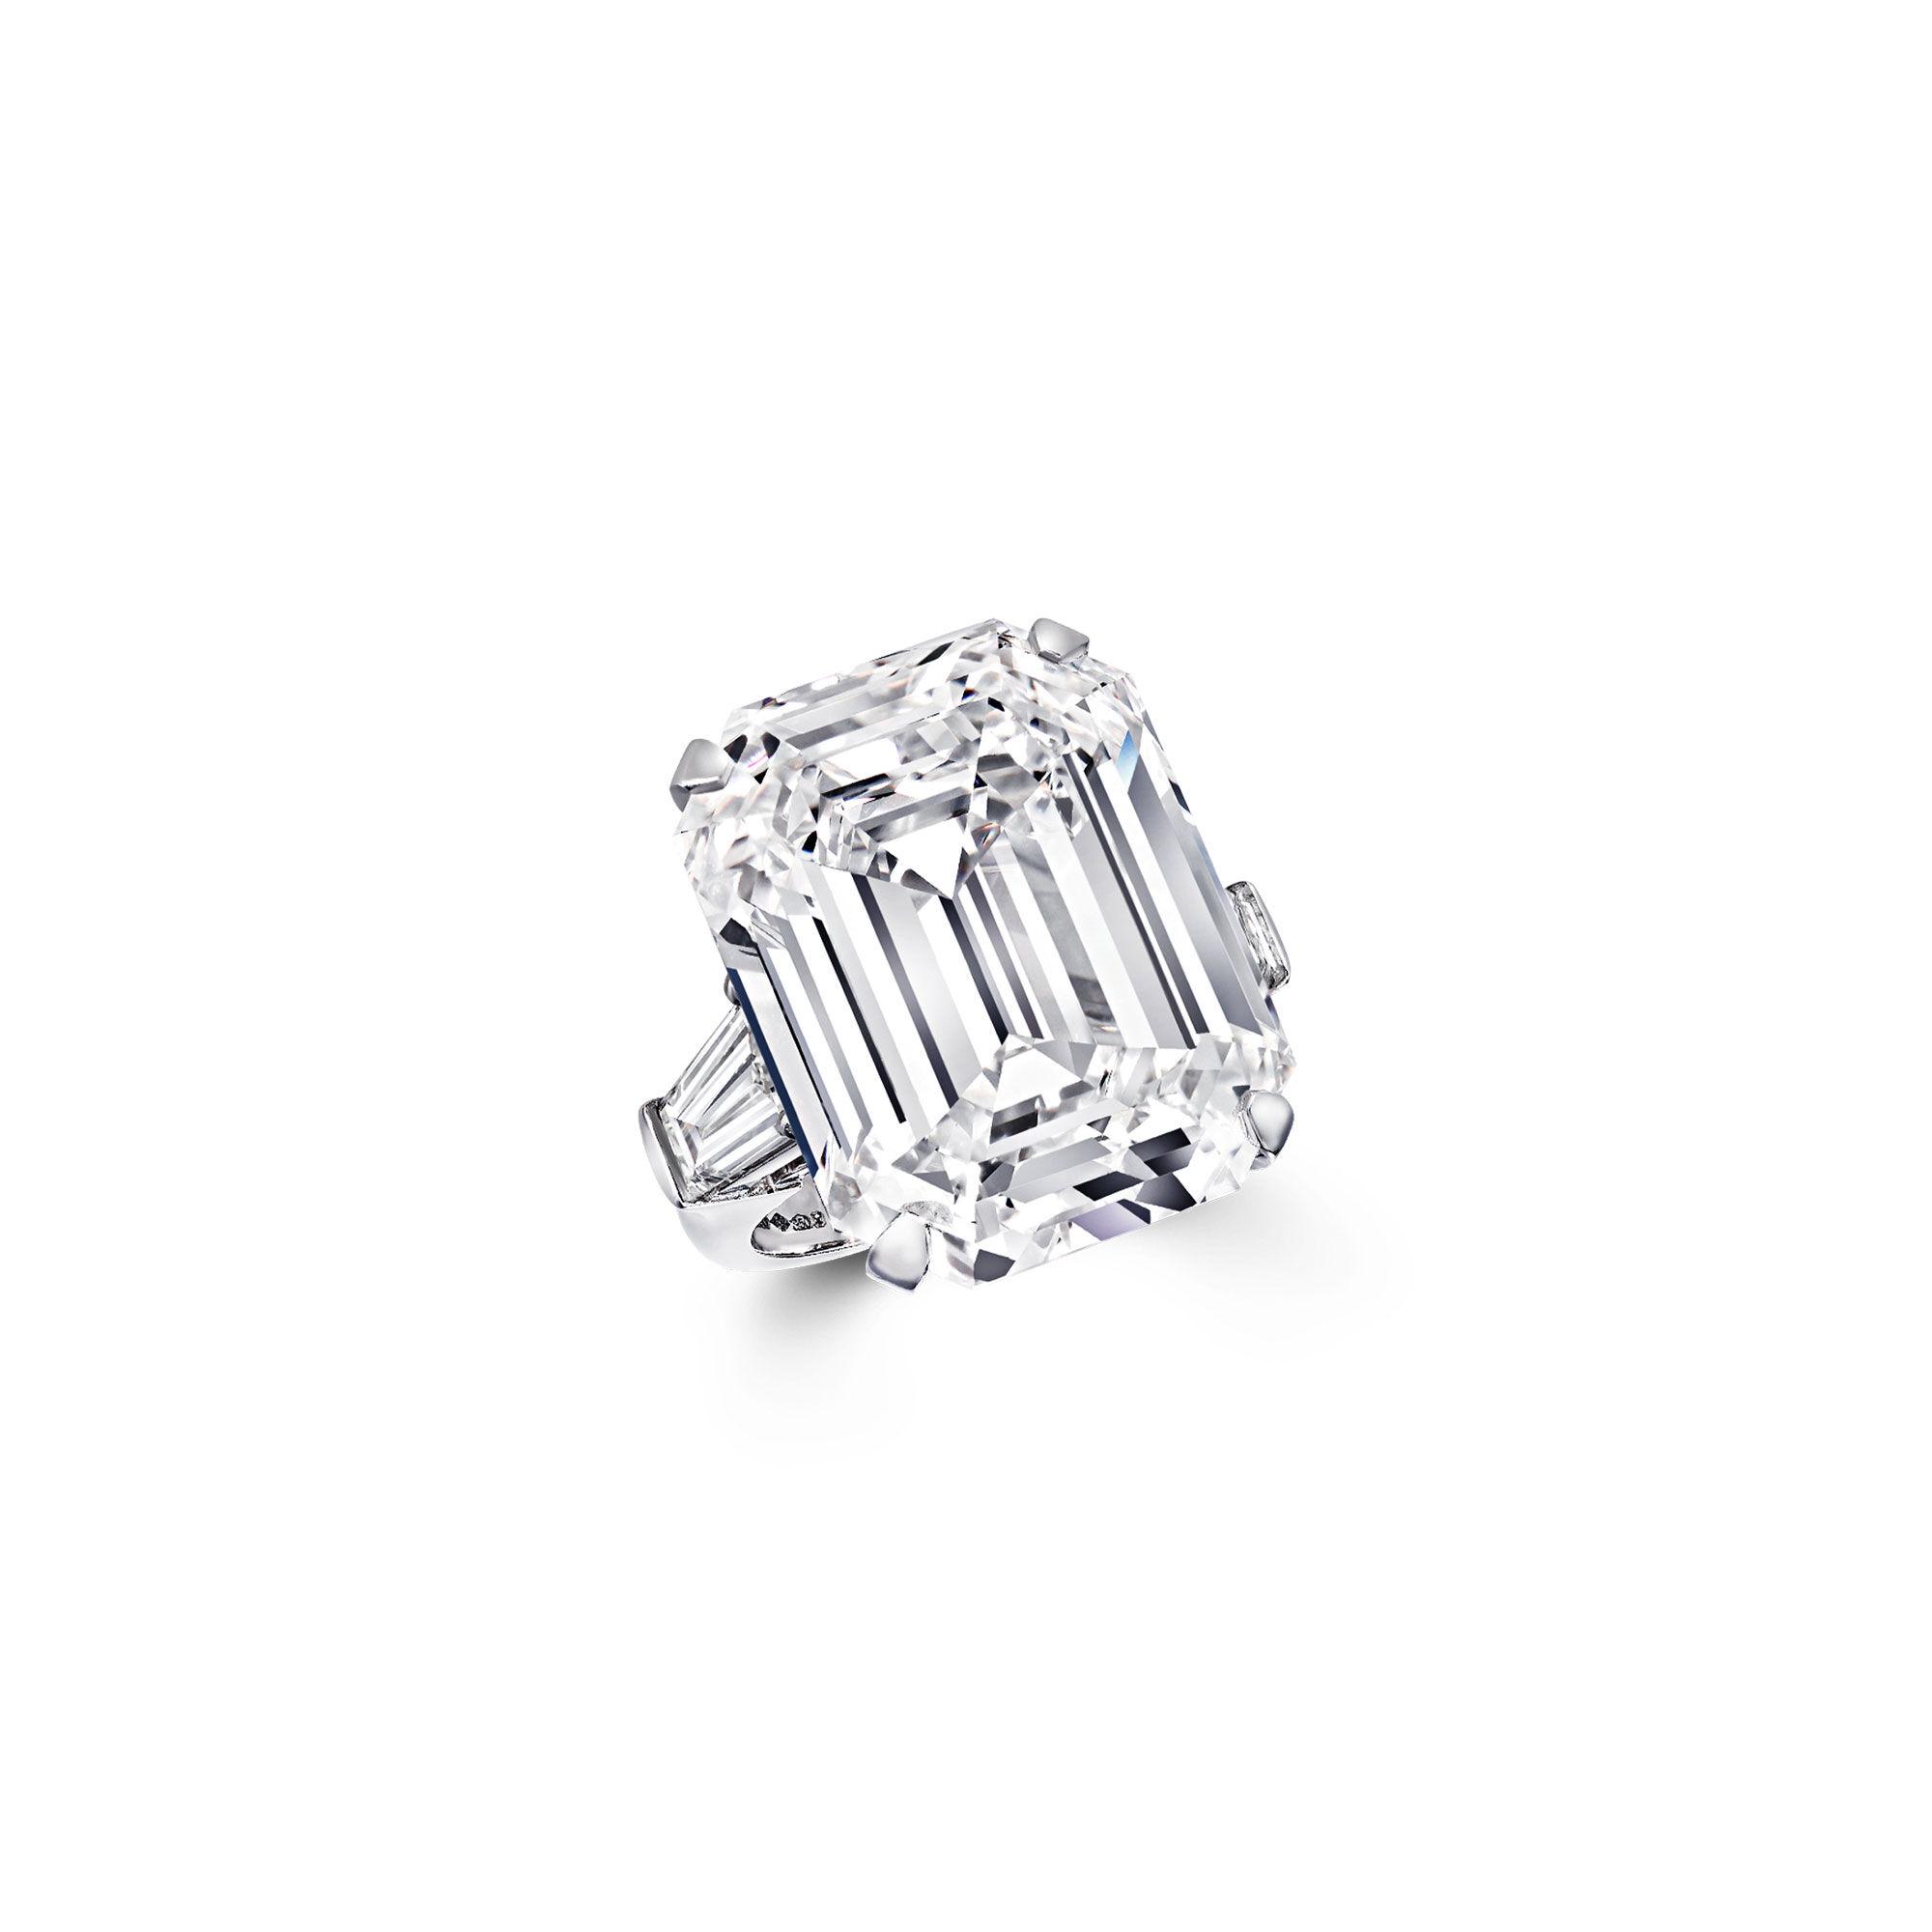 An emerald cut white diamond ring by Graff